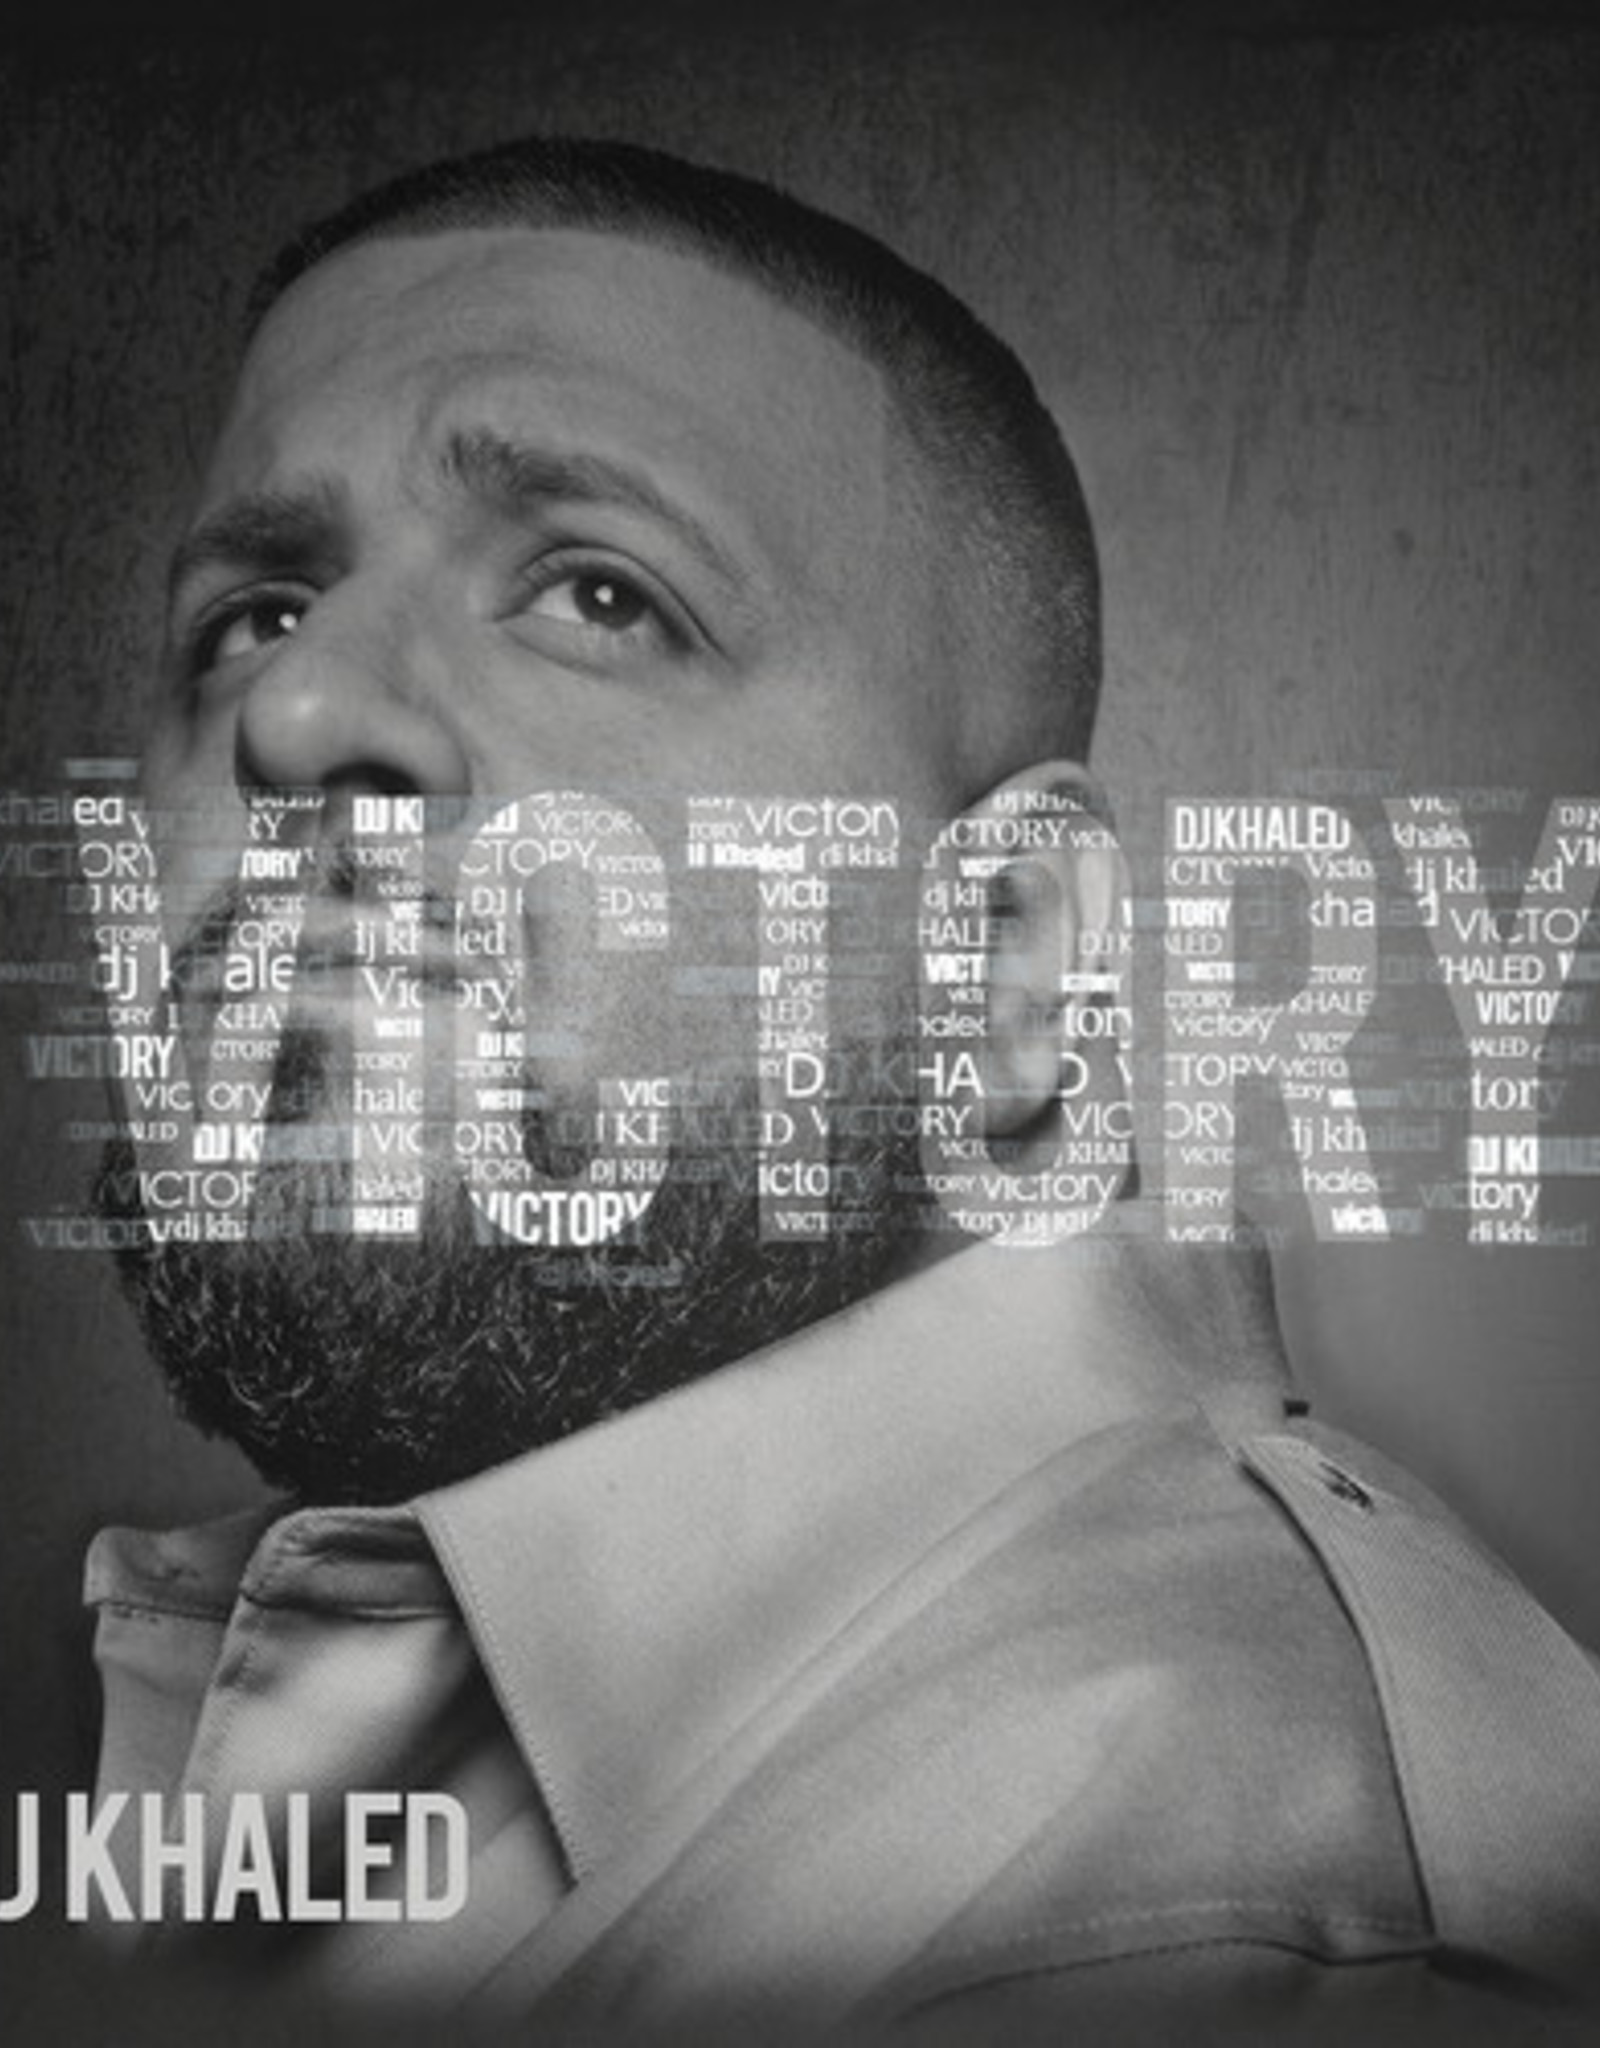 Dj Khaled - Victory (RSD 2019)